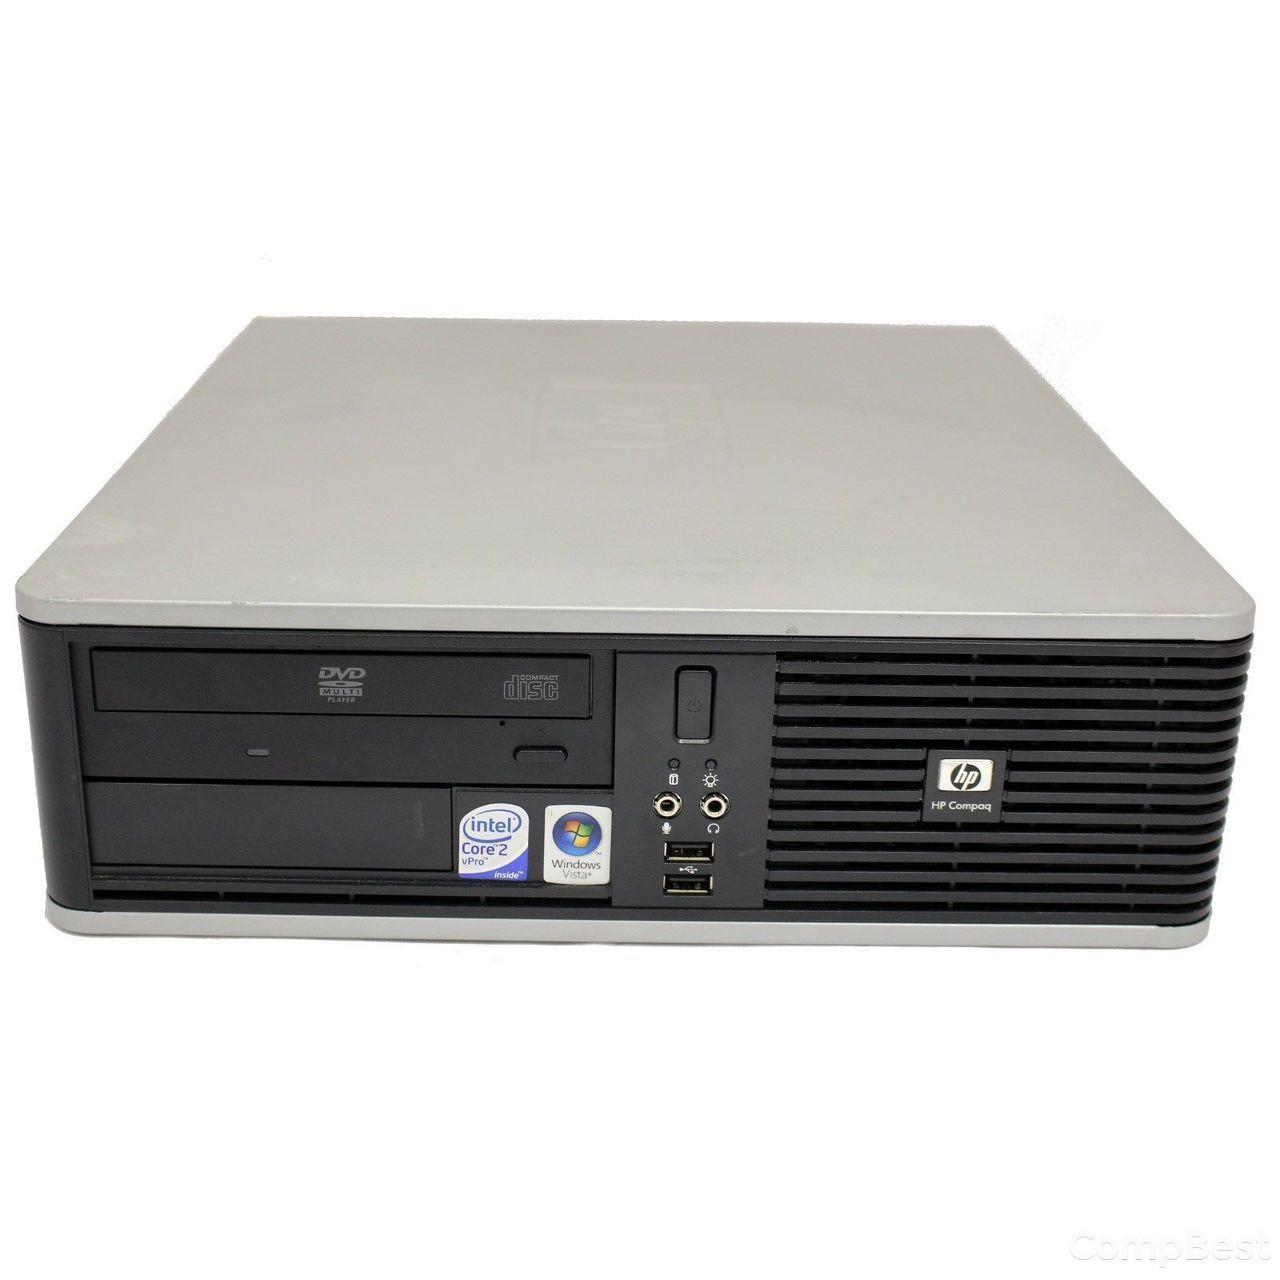 Hewlett-Packard DC7800 SFF / Intel Pentium Dual-Core E2160 (2 ядра по 1.8GHz) / 2GB DDR2 / 160GB HDD